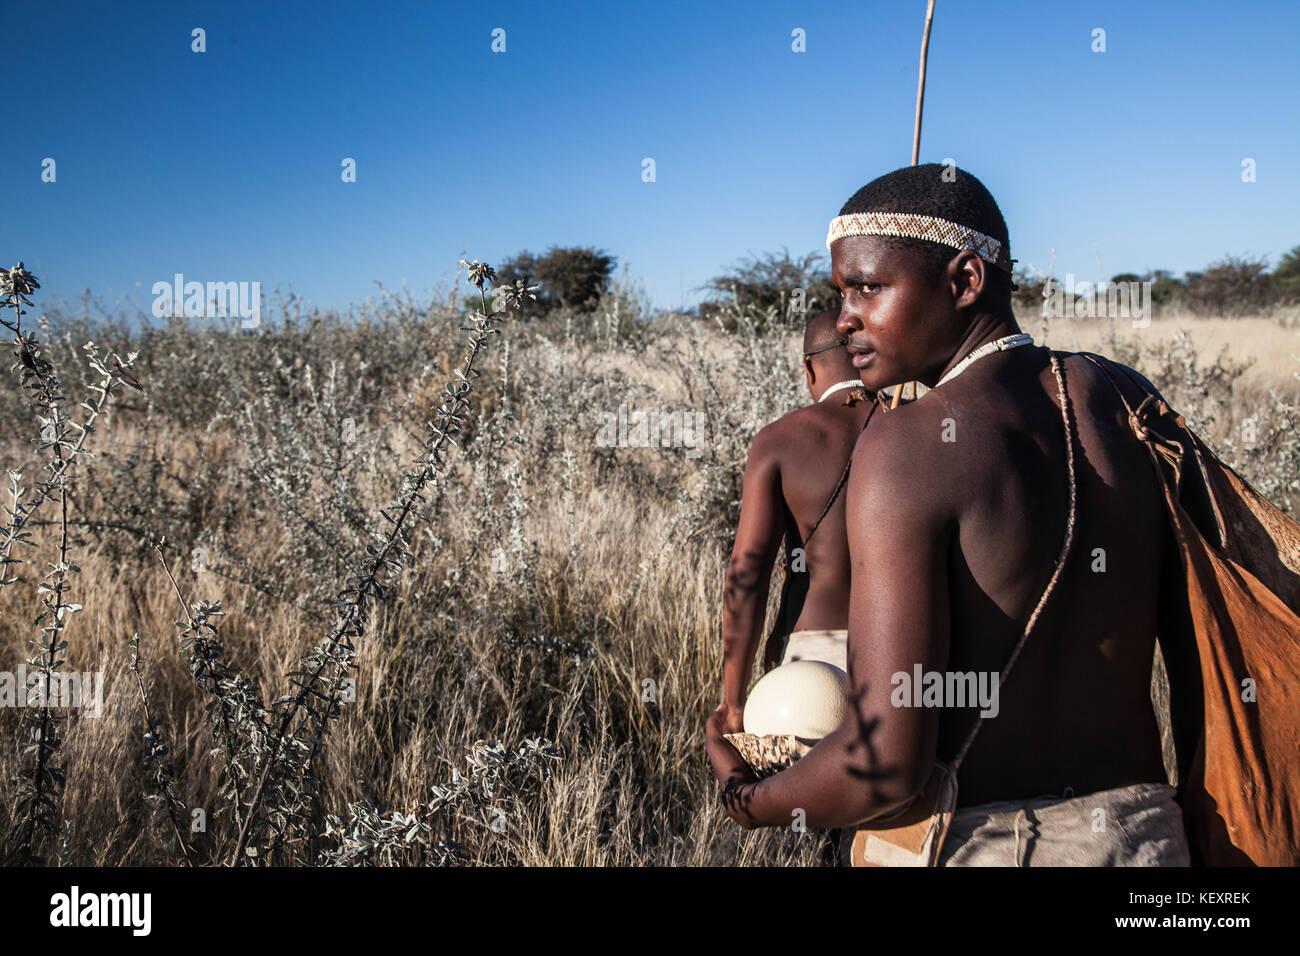 Photograph of two members of San people walking through underbrush in Kalahari Desert, Botswana - Stock Image